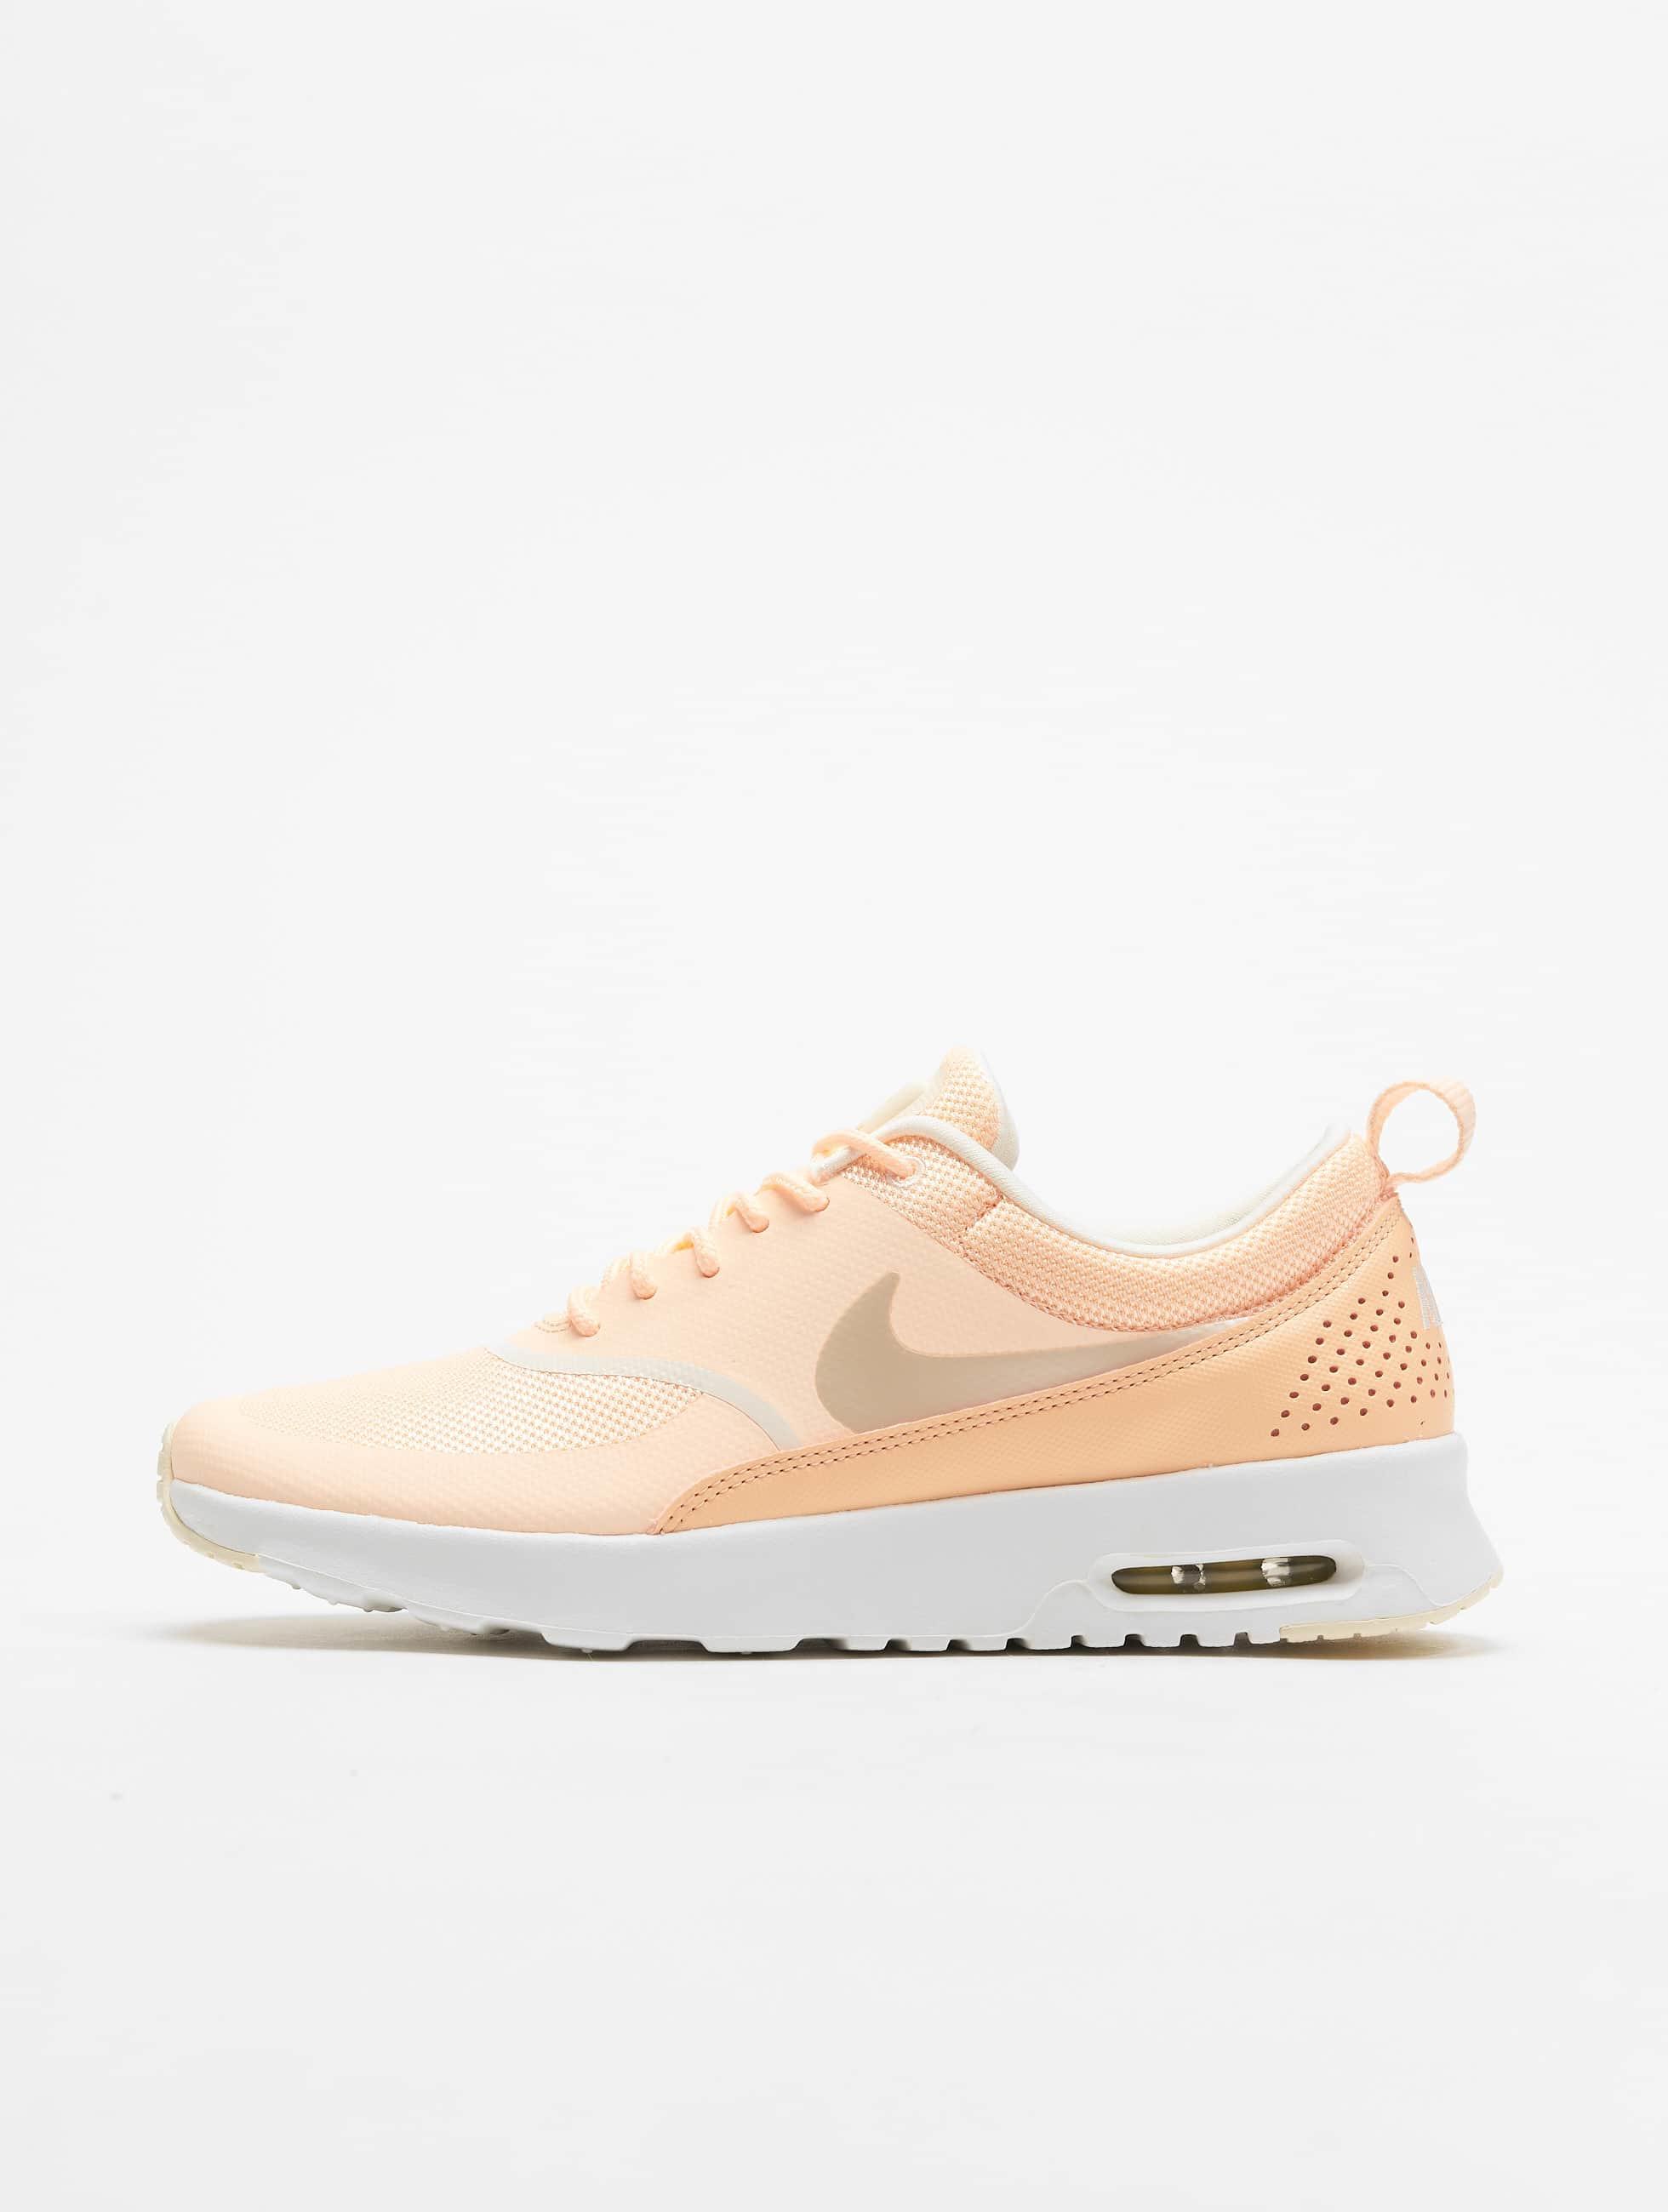 date de sortie: 6f864 4608b Nike Air Max Thea Sneakers Crimson Tint/Pale Ivory/Celery